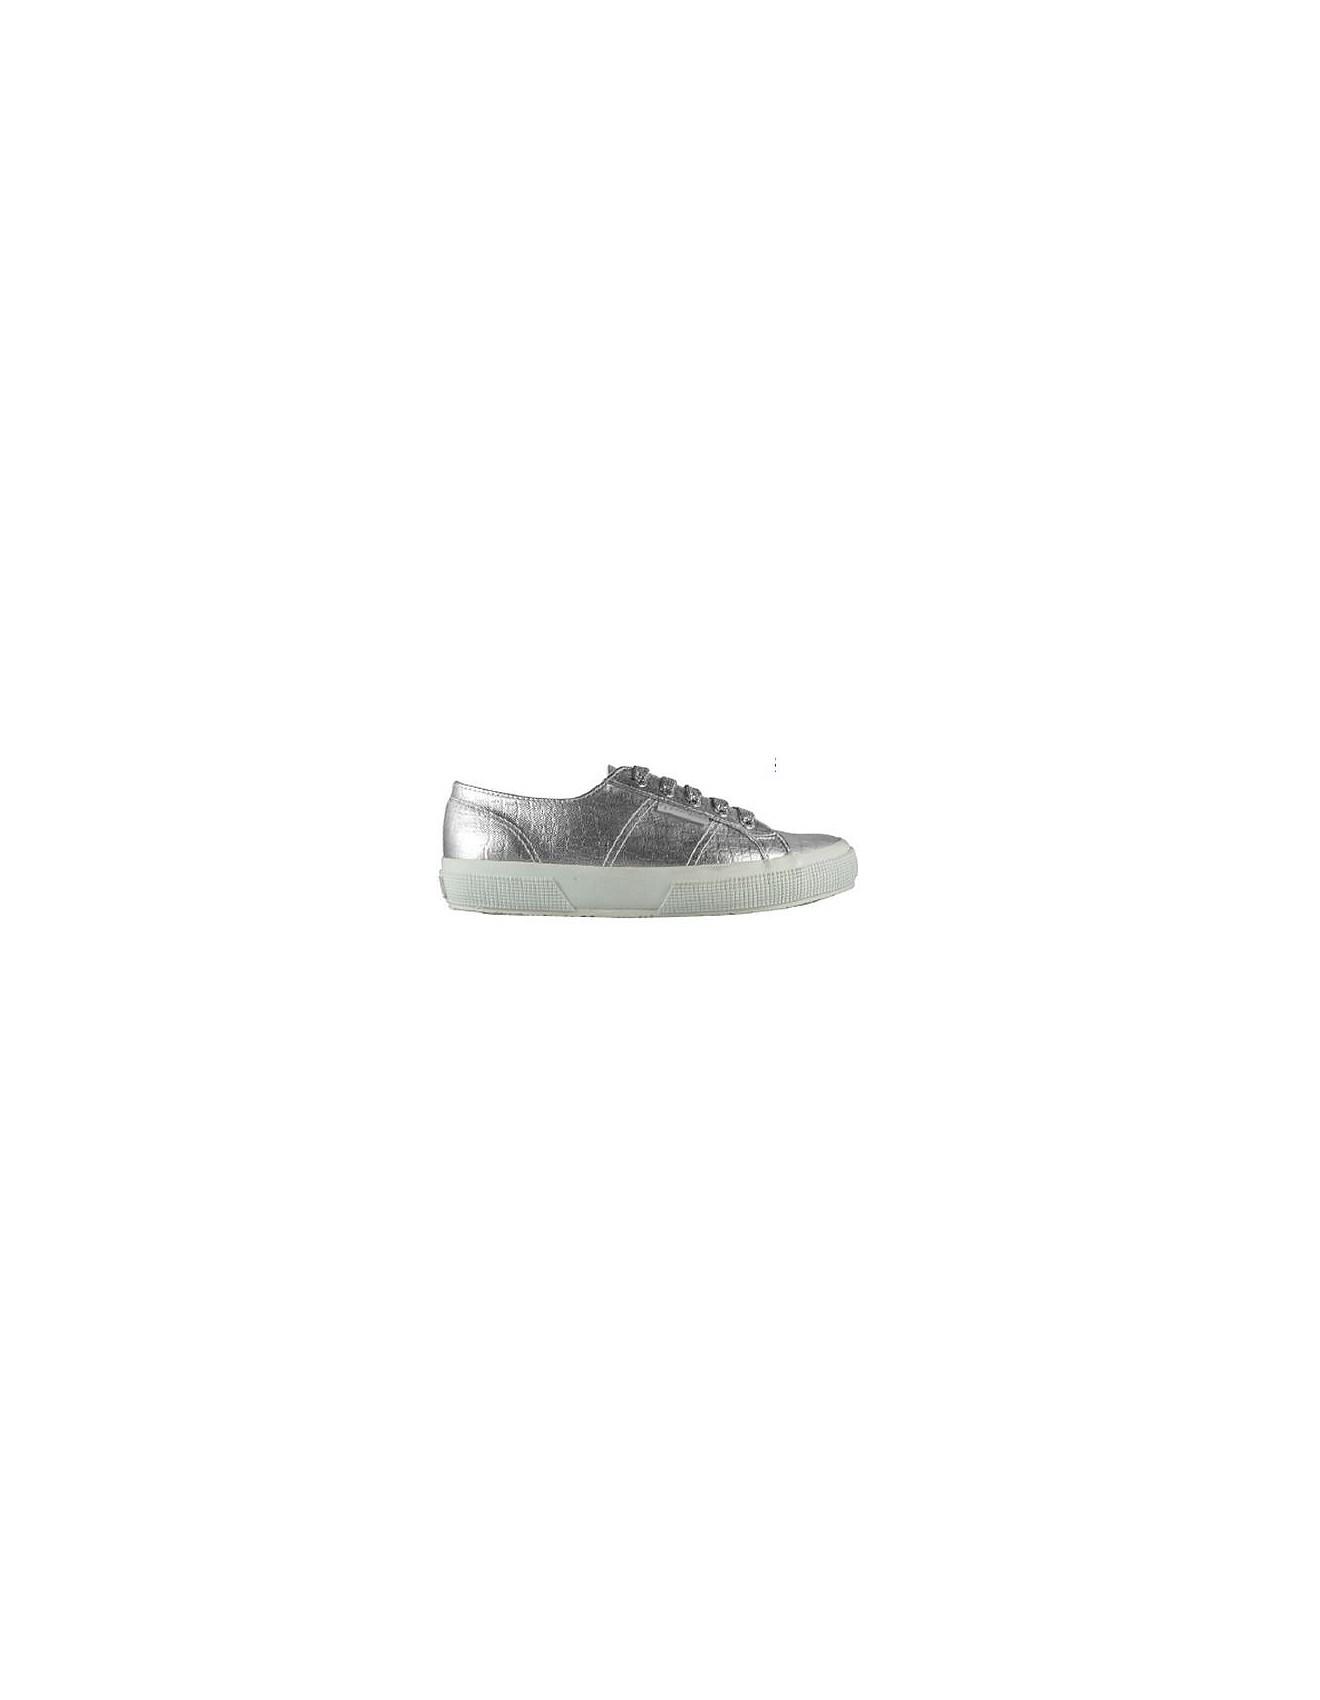 4339a8c67668b Women's Shoes & Sneakers | Women's Sneakers Online | David Jones ...